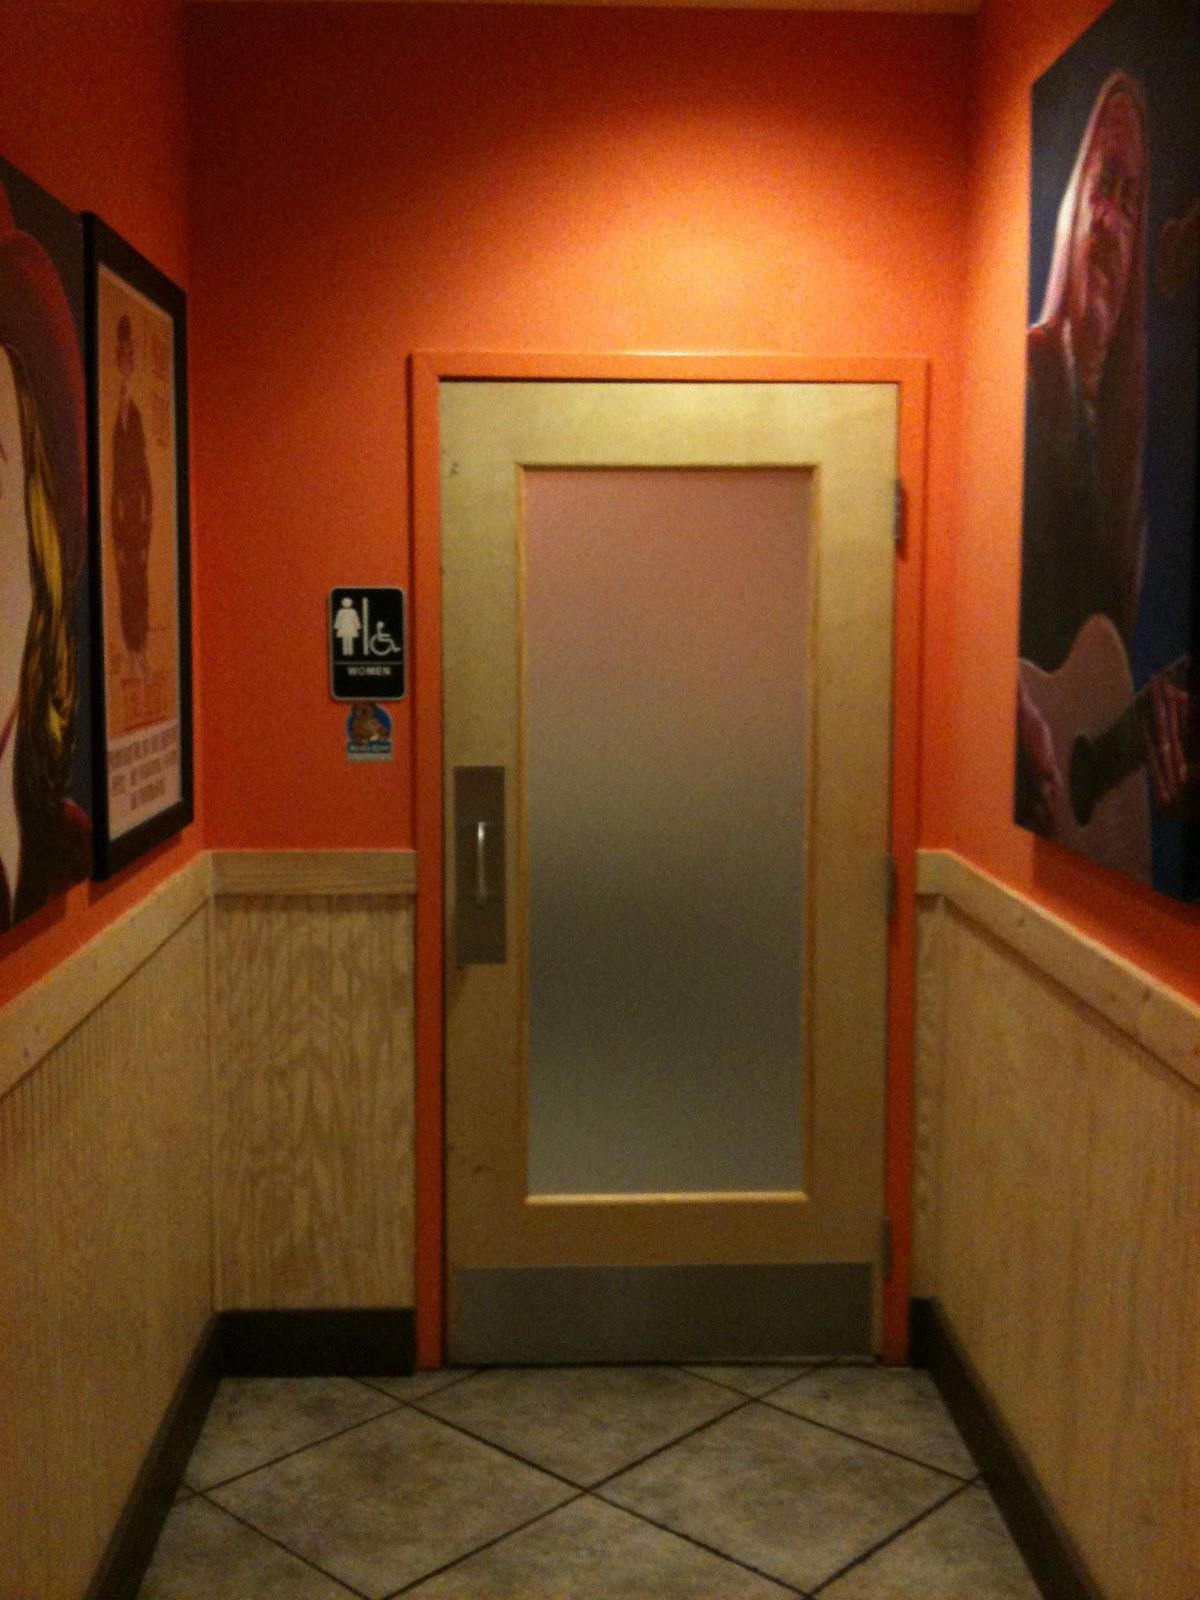 Public Bathroom Blog Jackie O Can Spice Up A Restroom